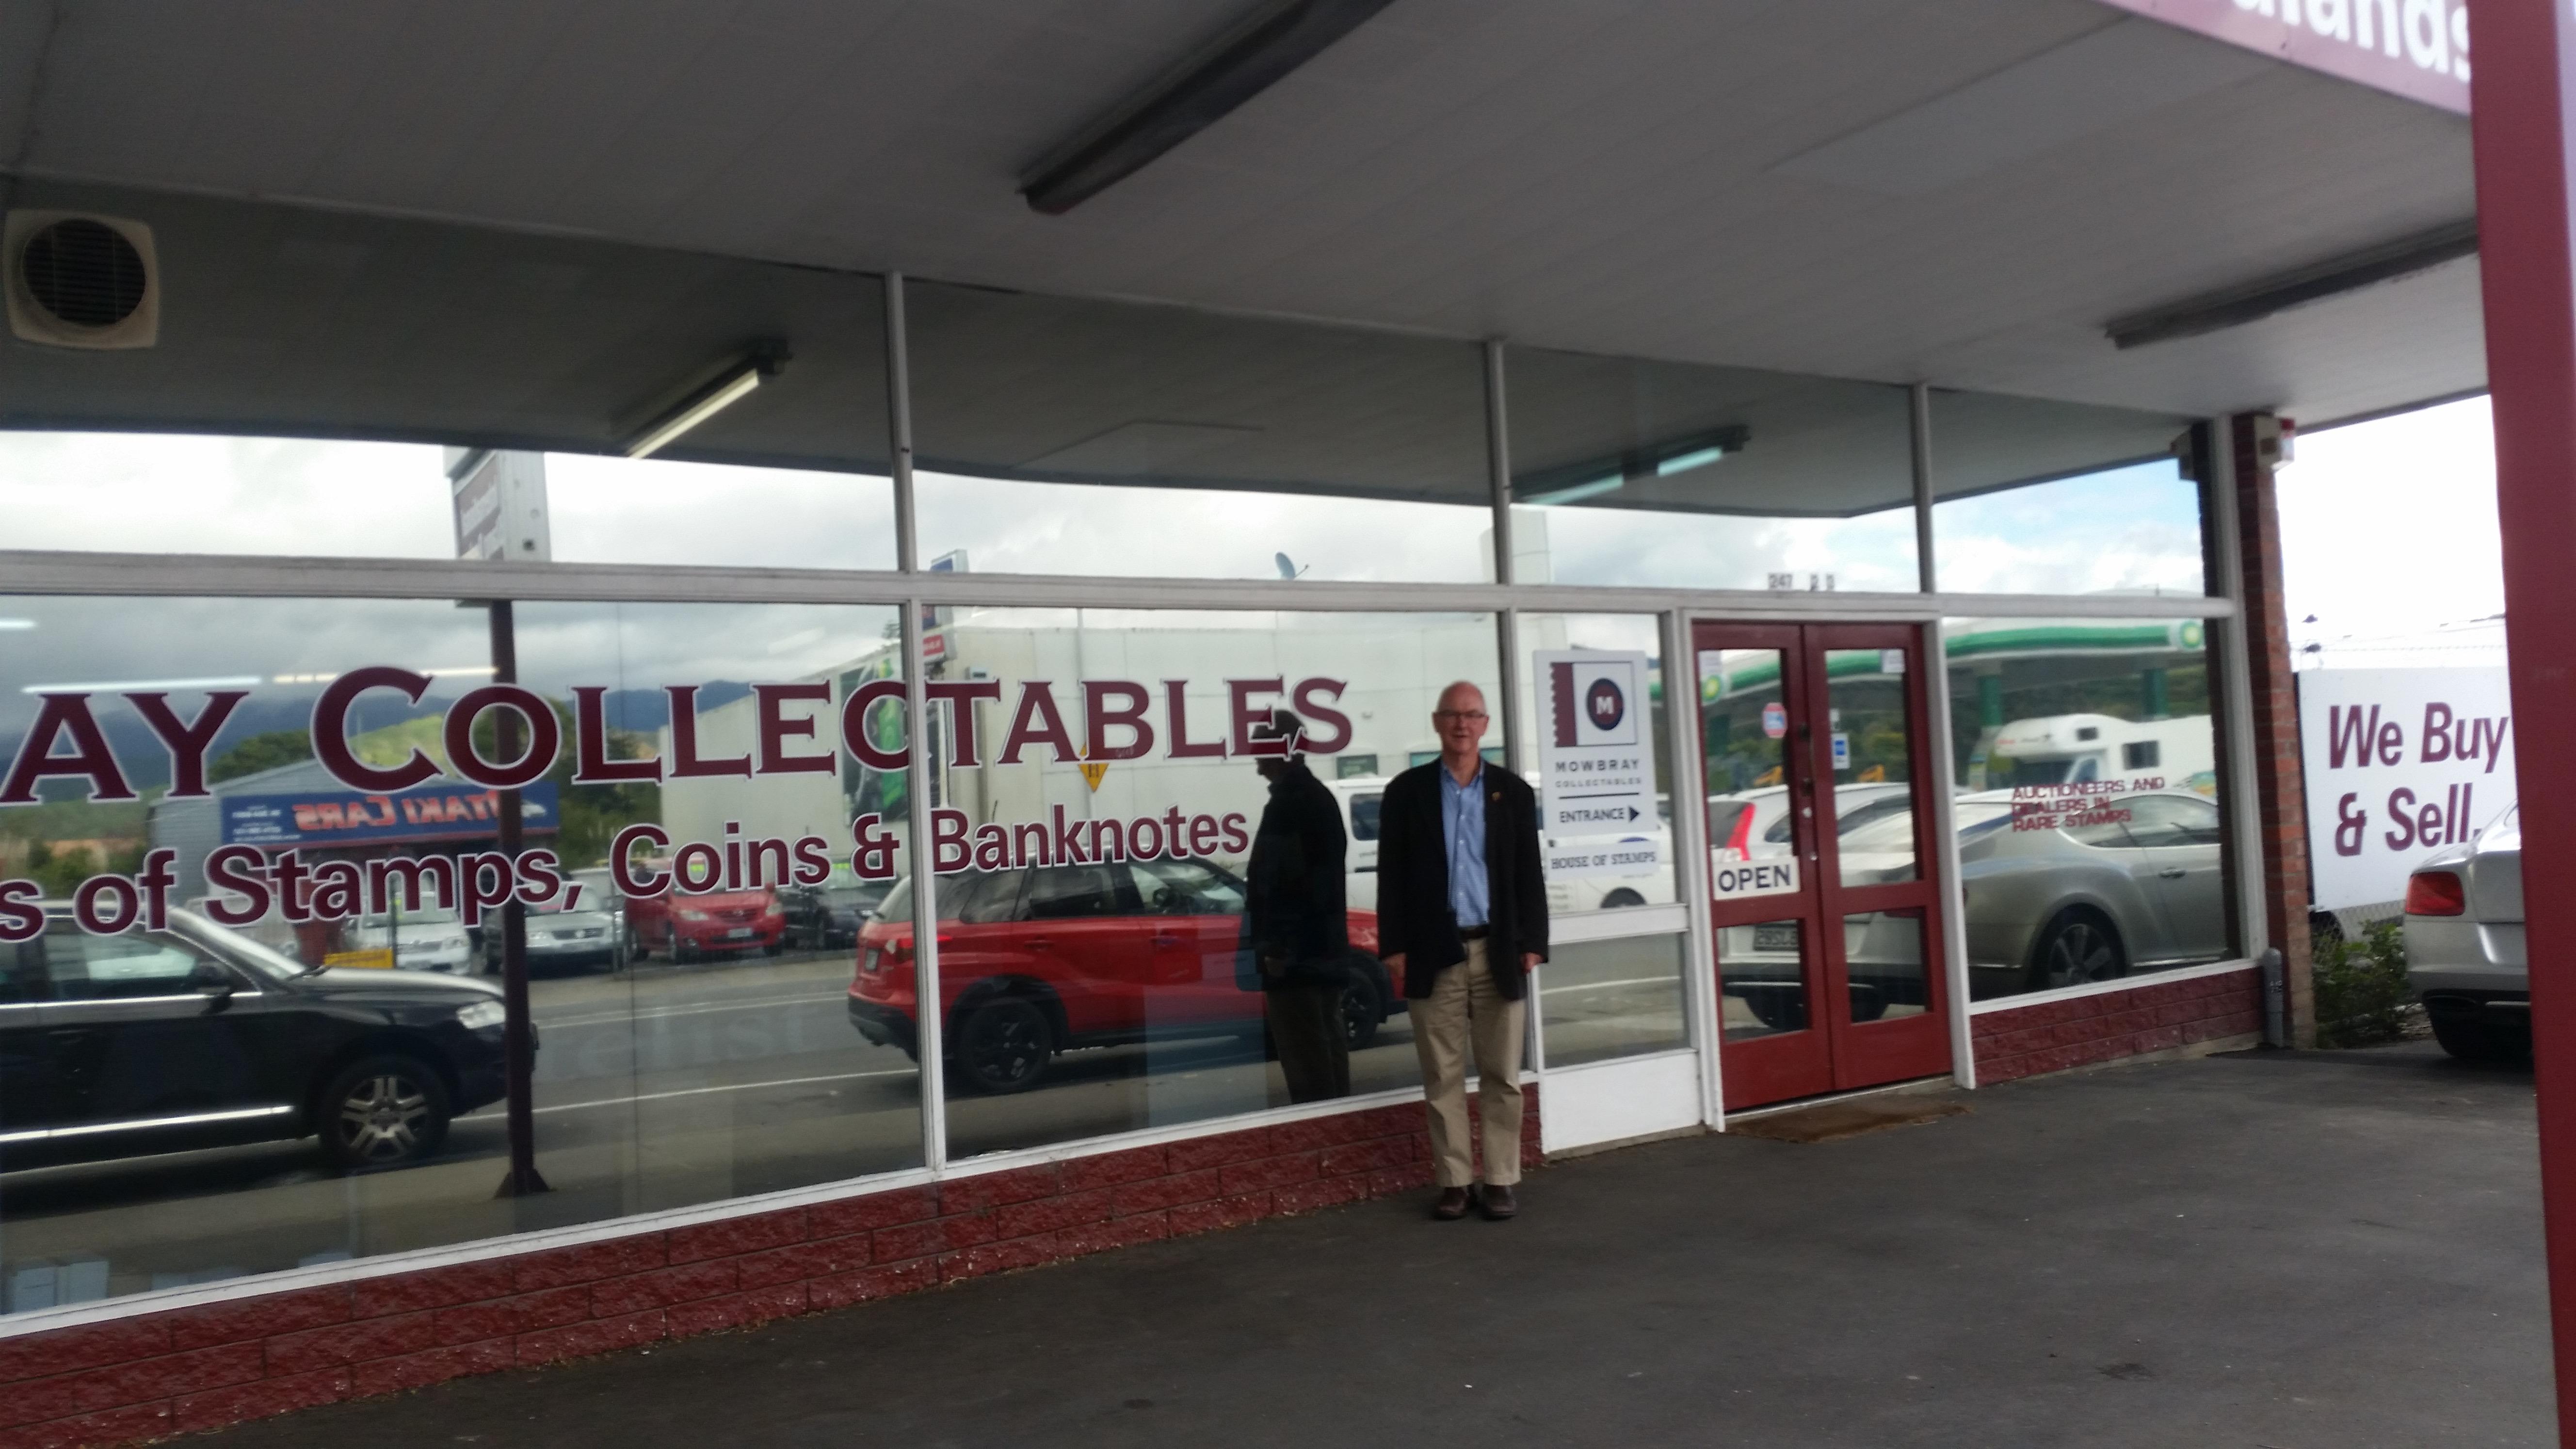 NZ Richard at Mowbrays Stamp Dealers Head office in Otika